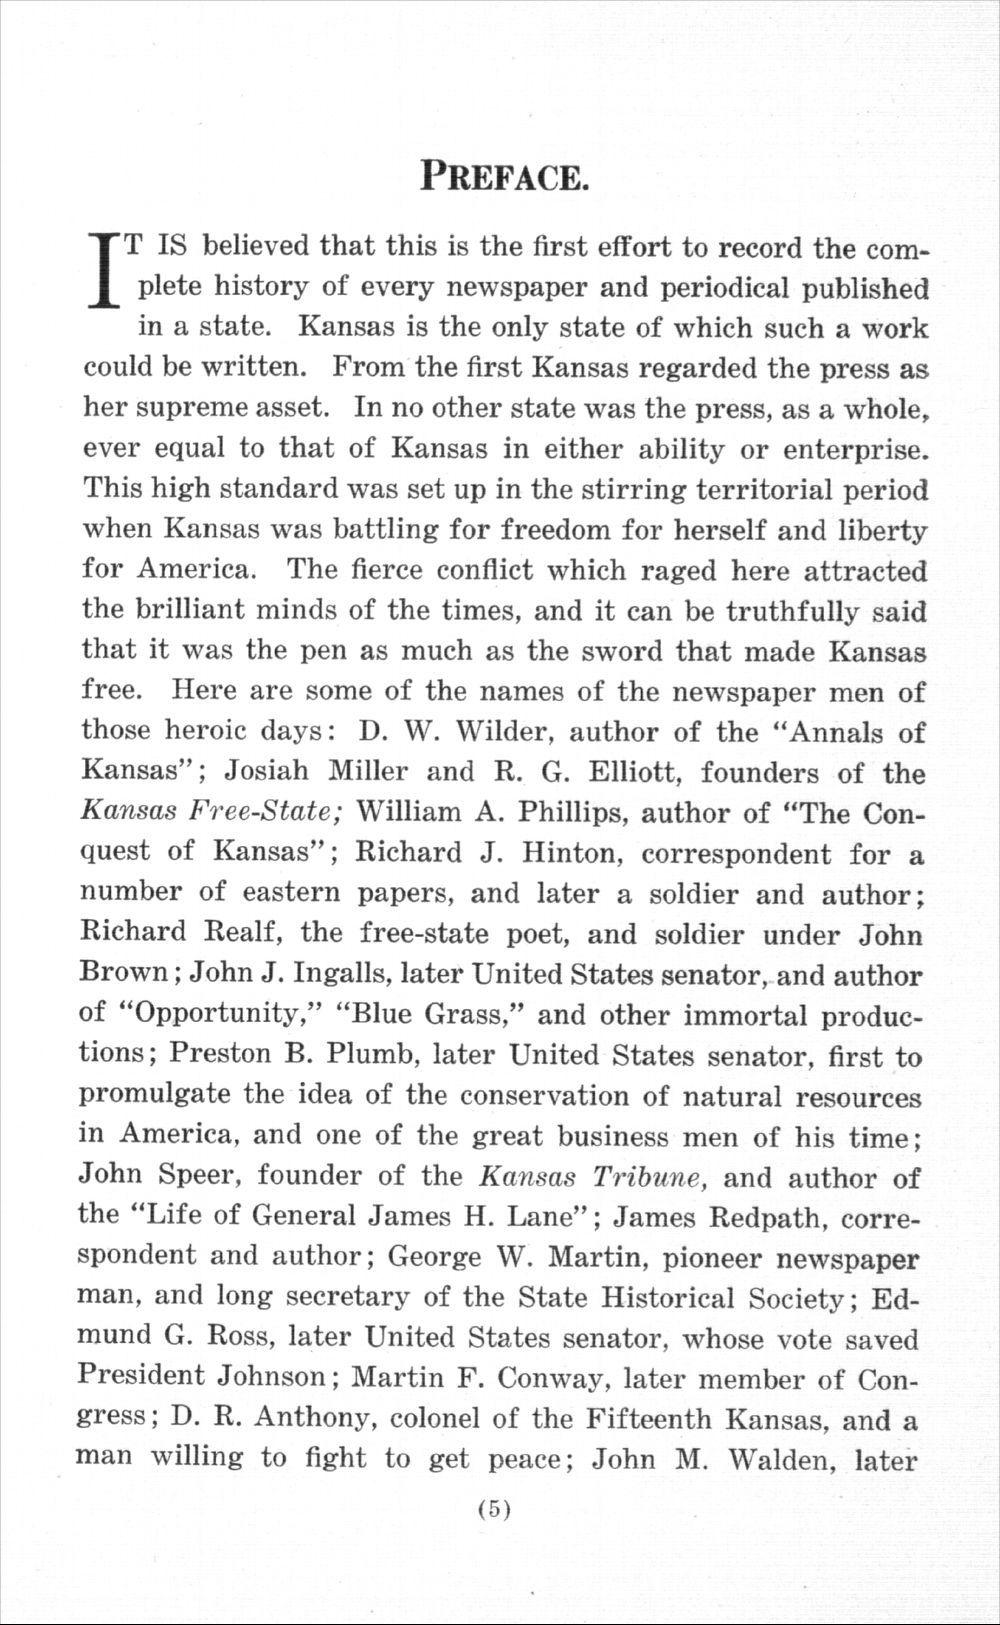 History of Kansas newspapers - 5